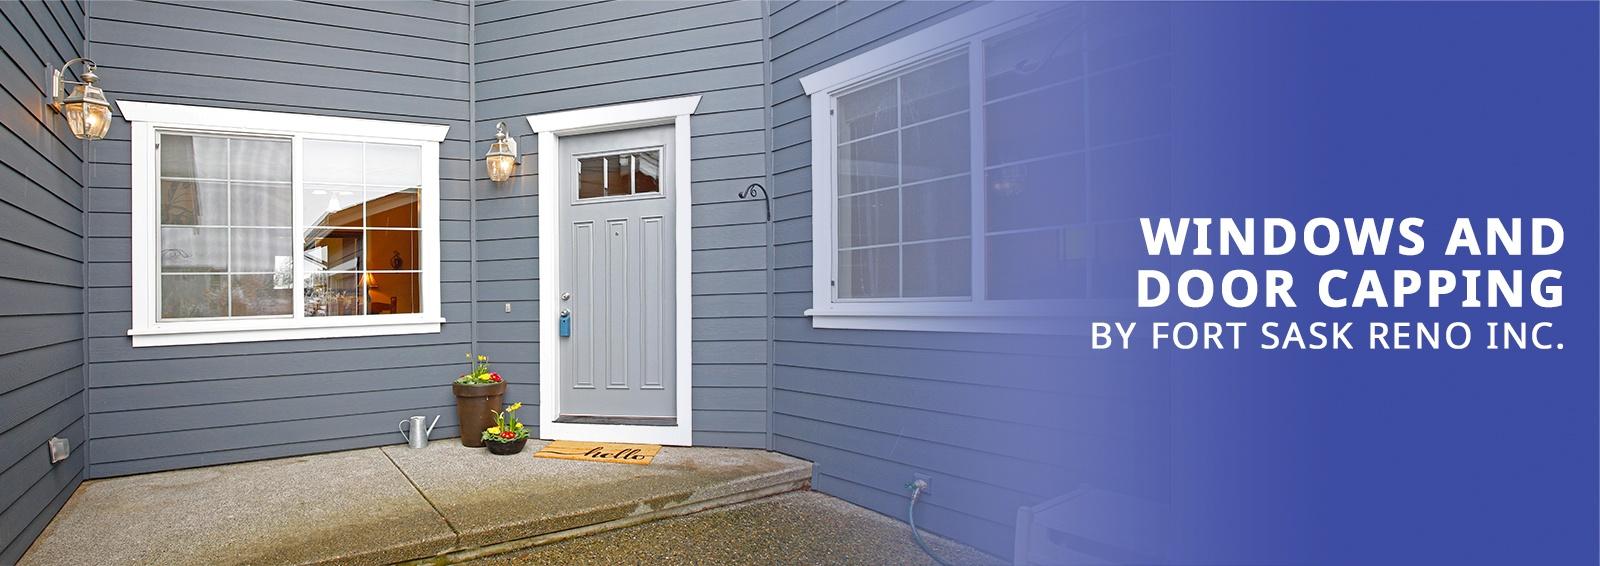 Fort Sask Reno - Windows and Door Capping